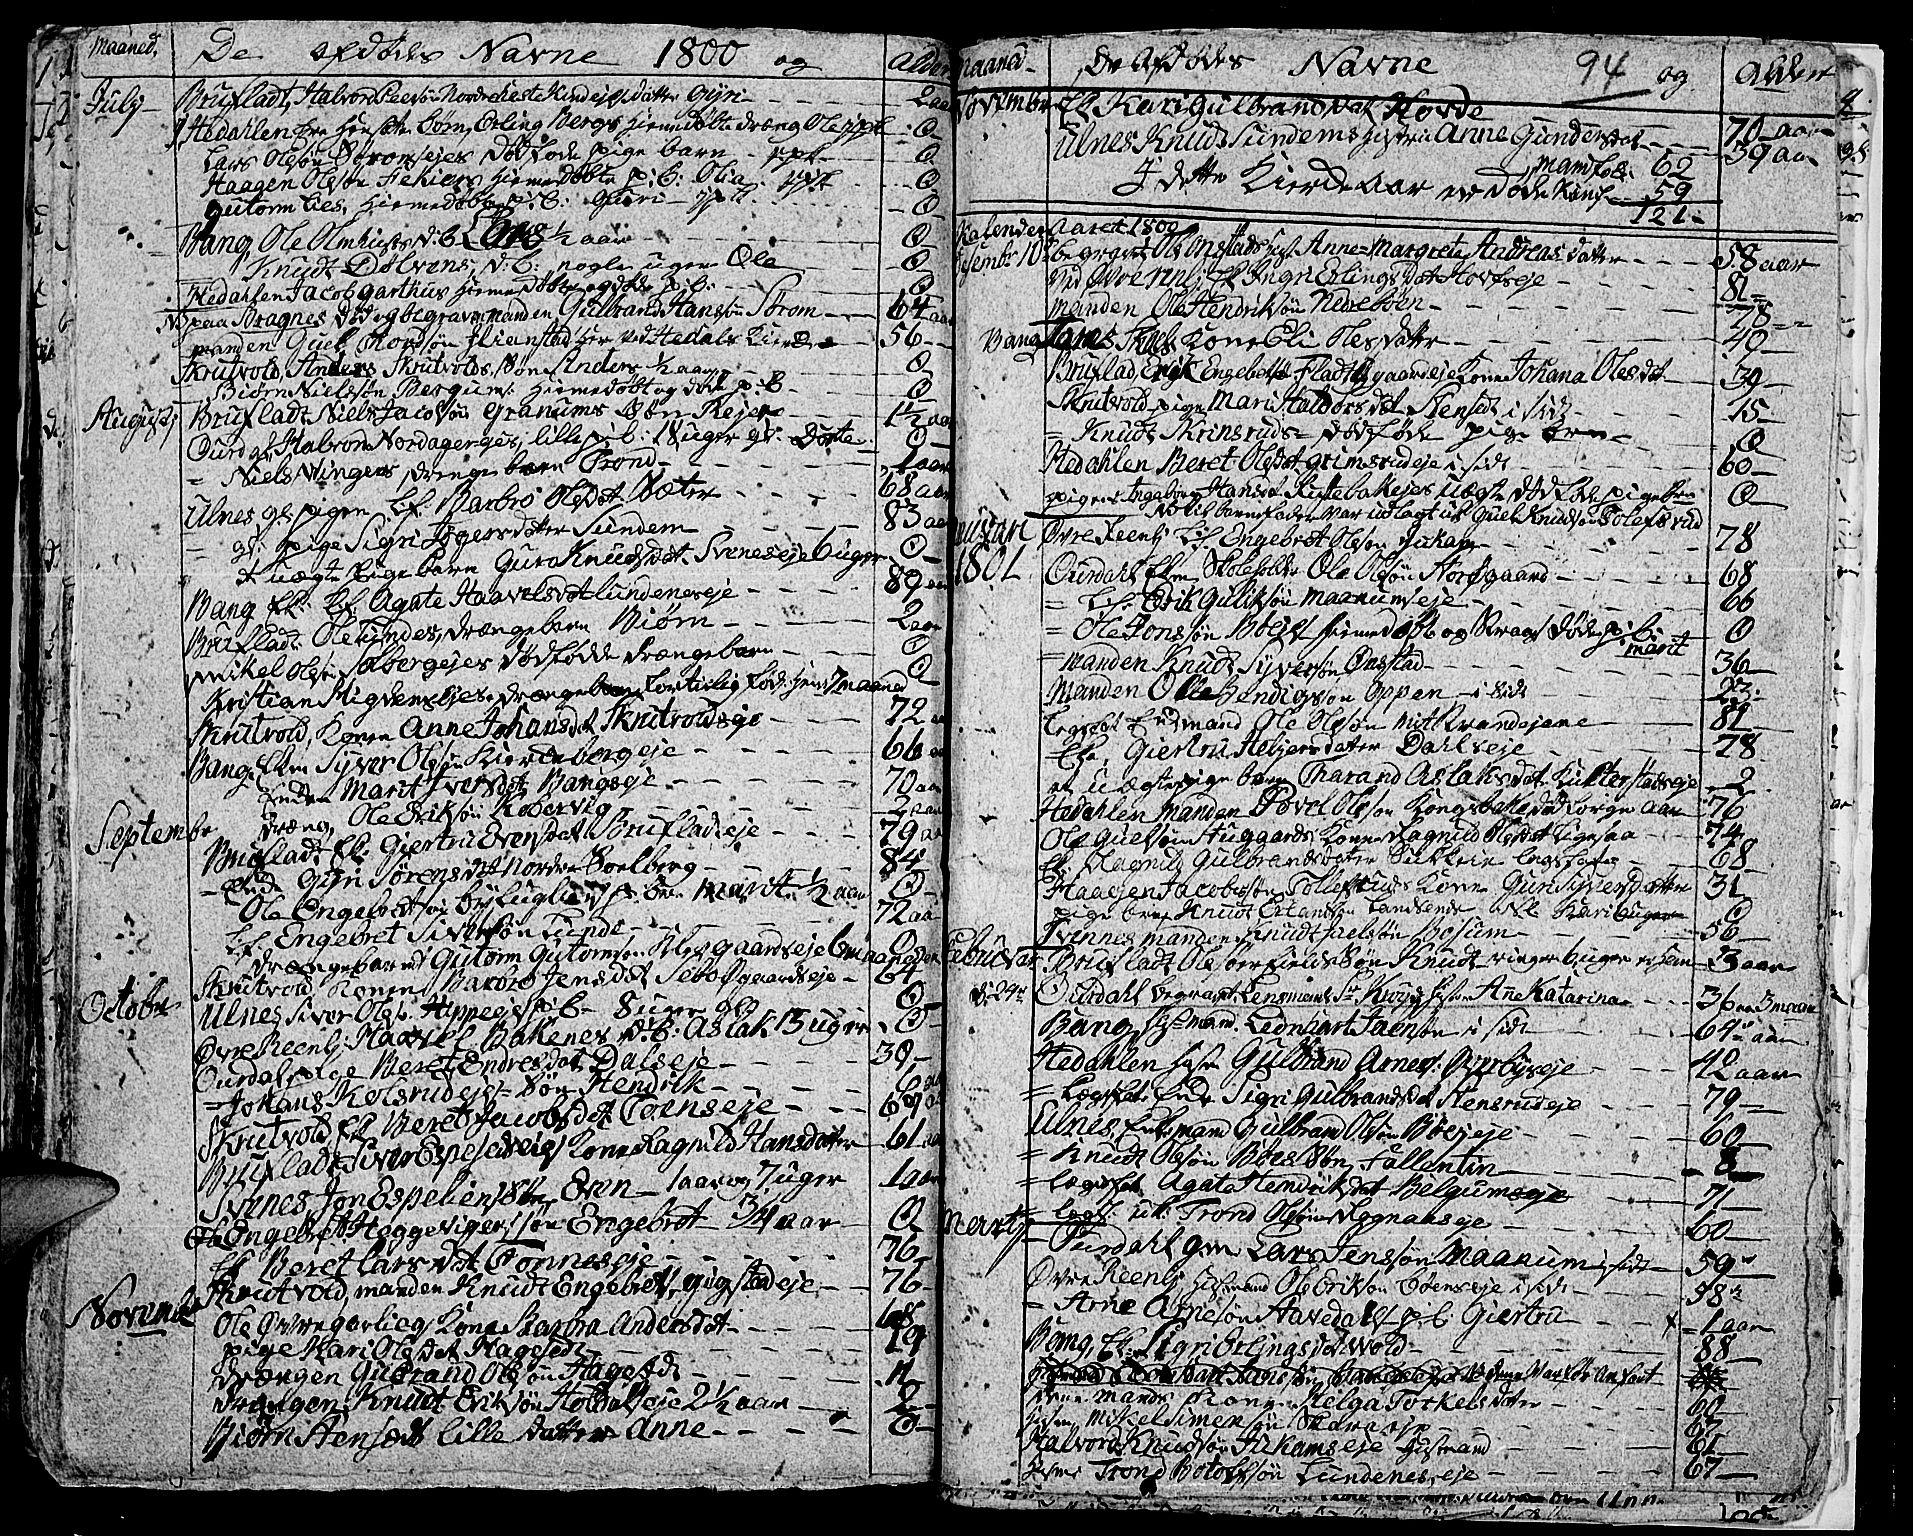 SAH, Aurdal prestekontor, Ministerialbok nr. 7, 1800-1808, s. 94